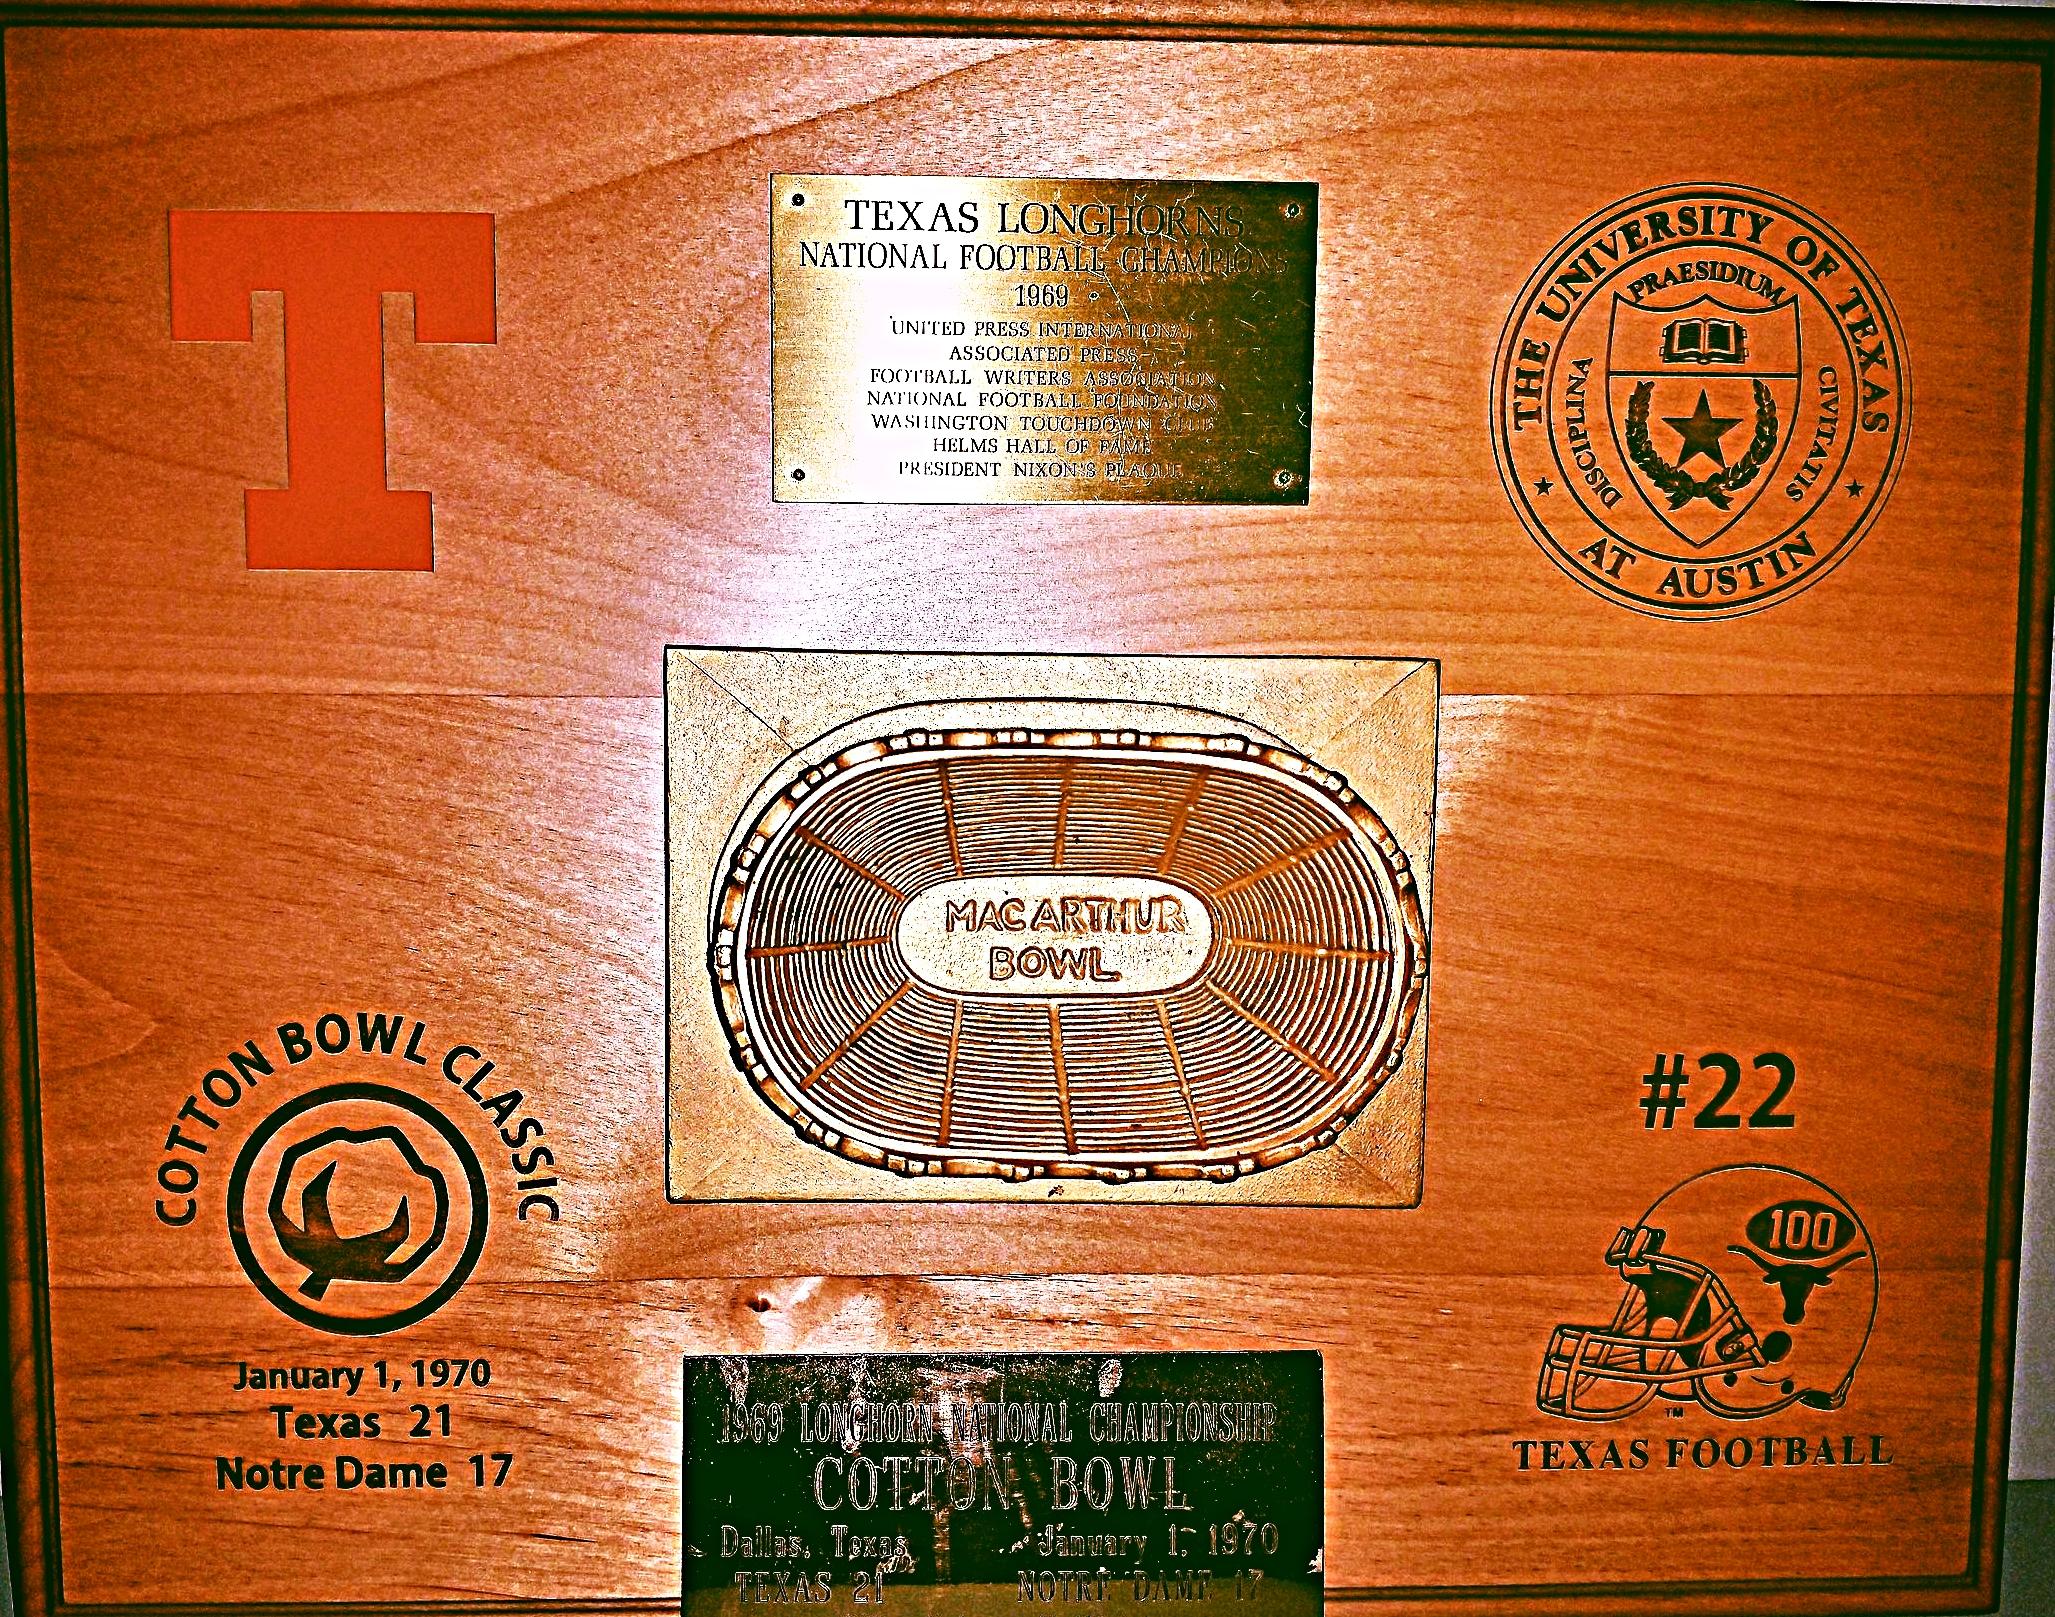 1969 National Championship plaque